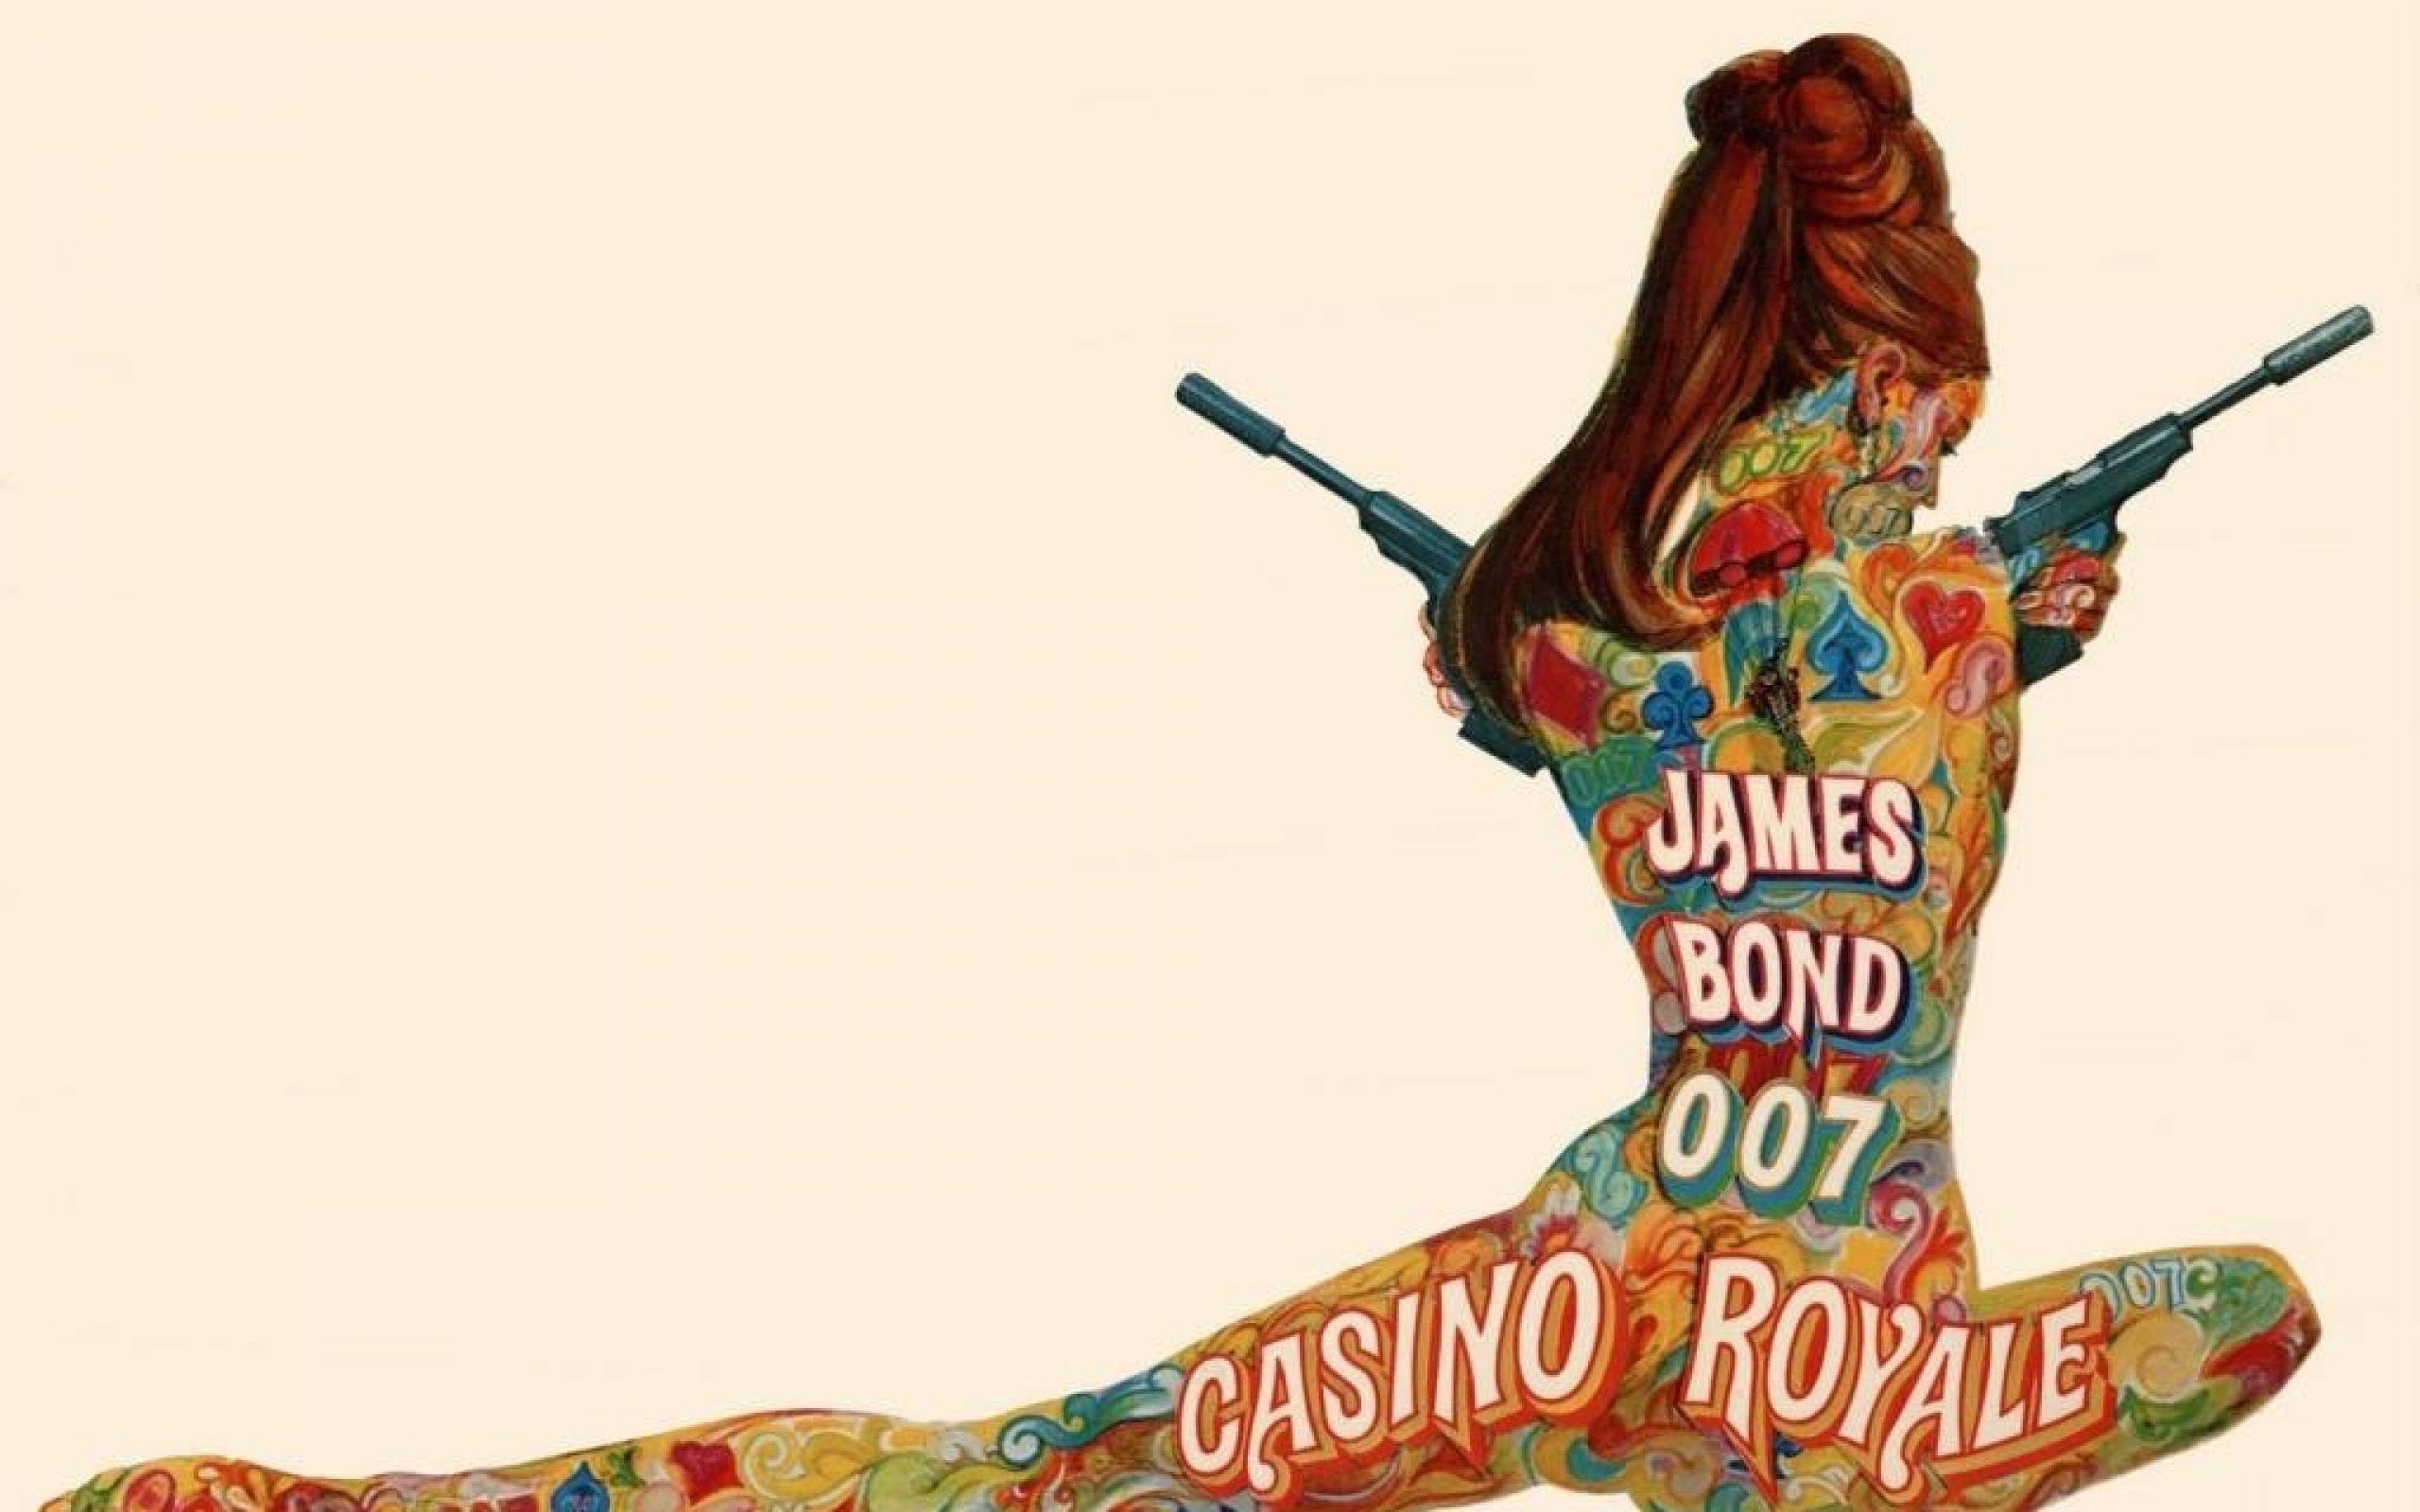 casino royale wallpaper poster - photo #22